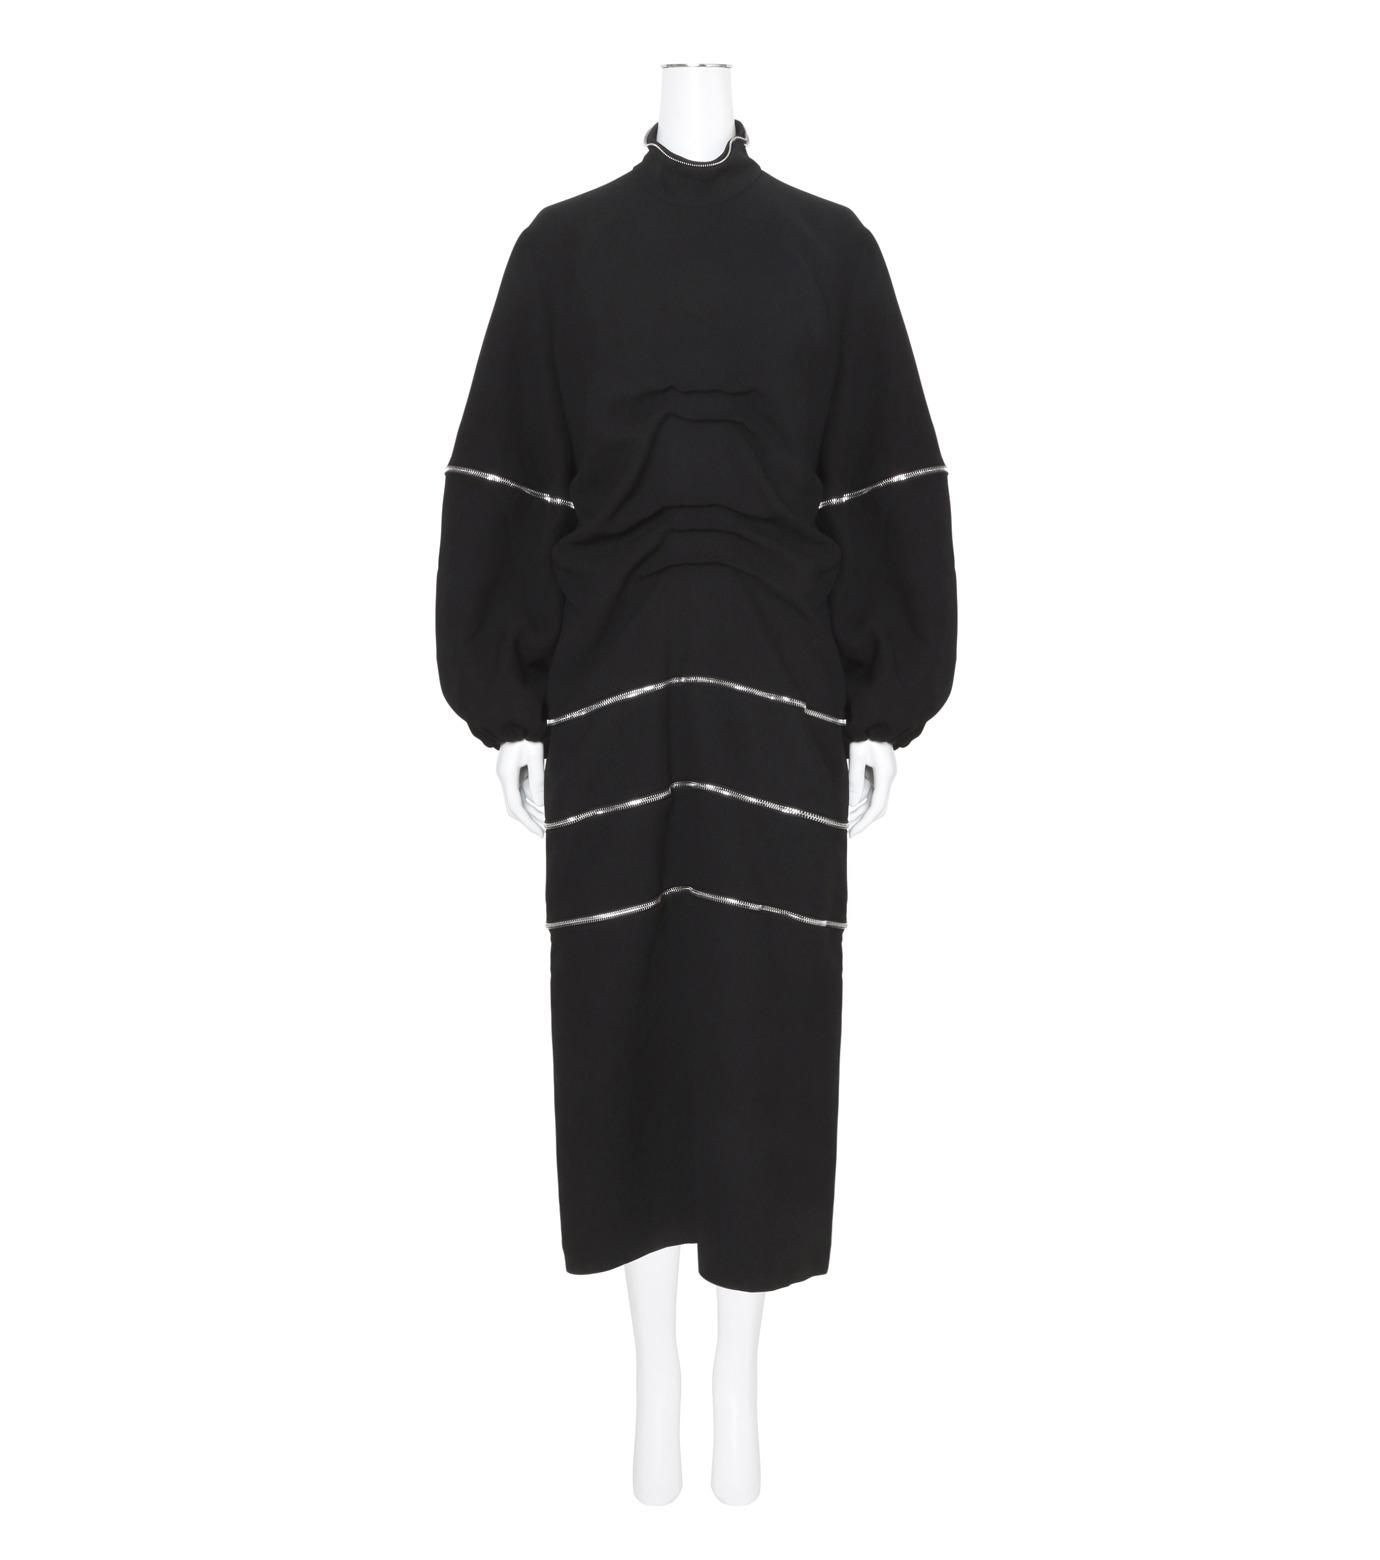 J.W.Anderson(ジェイダブリュー アンダーソン)のGathered Midi Dress-BLACK(ワンピース/one piece)-DR06WP16-13 拡大詳細画像1